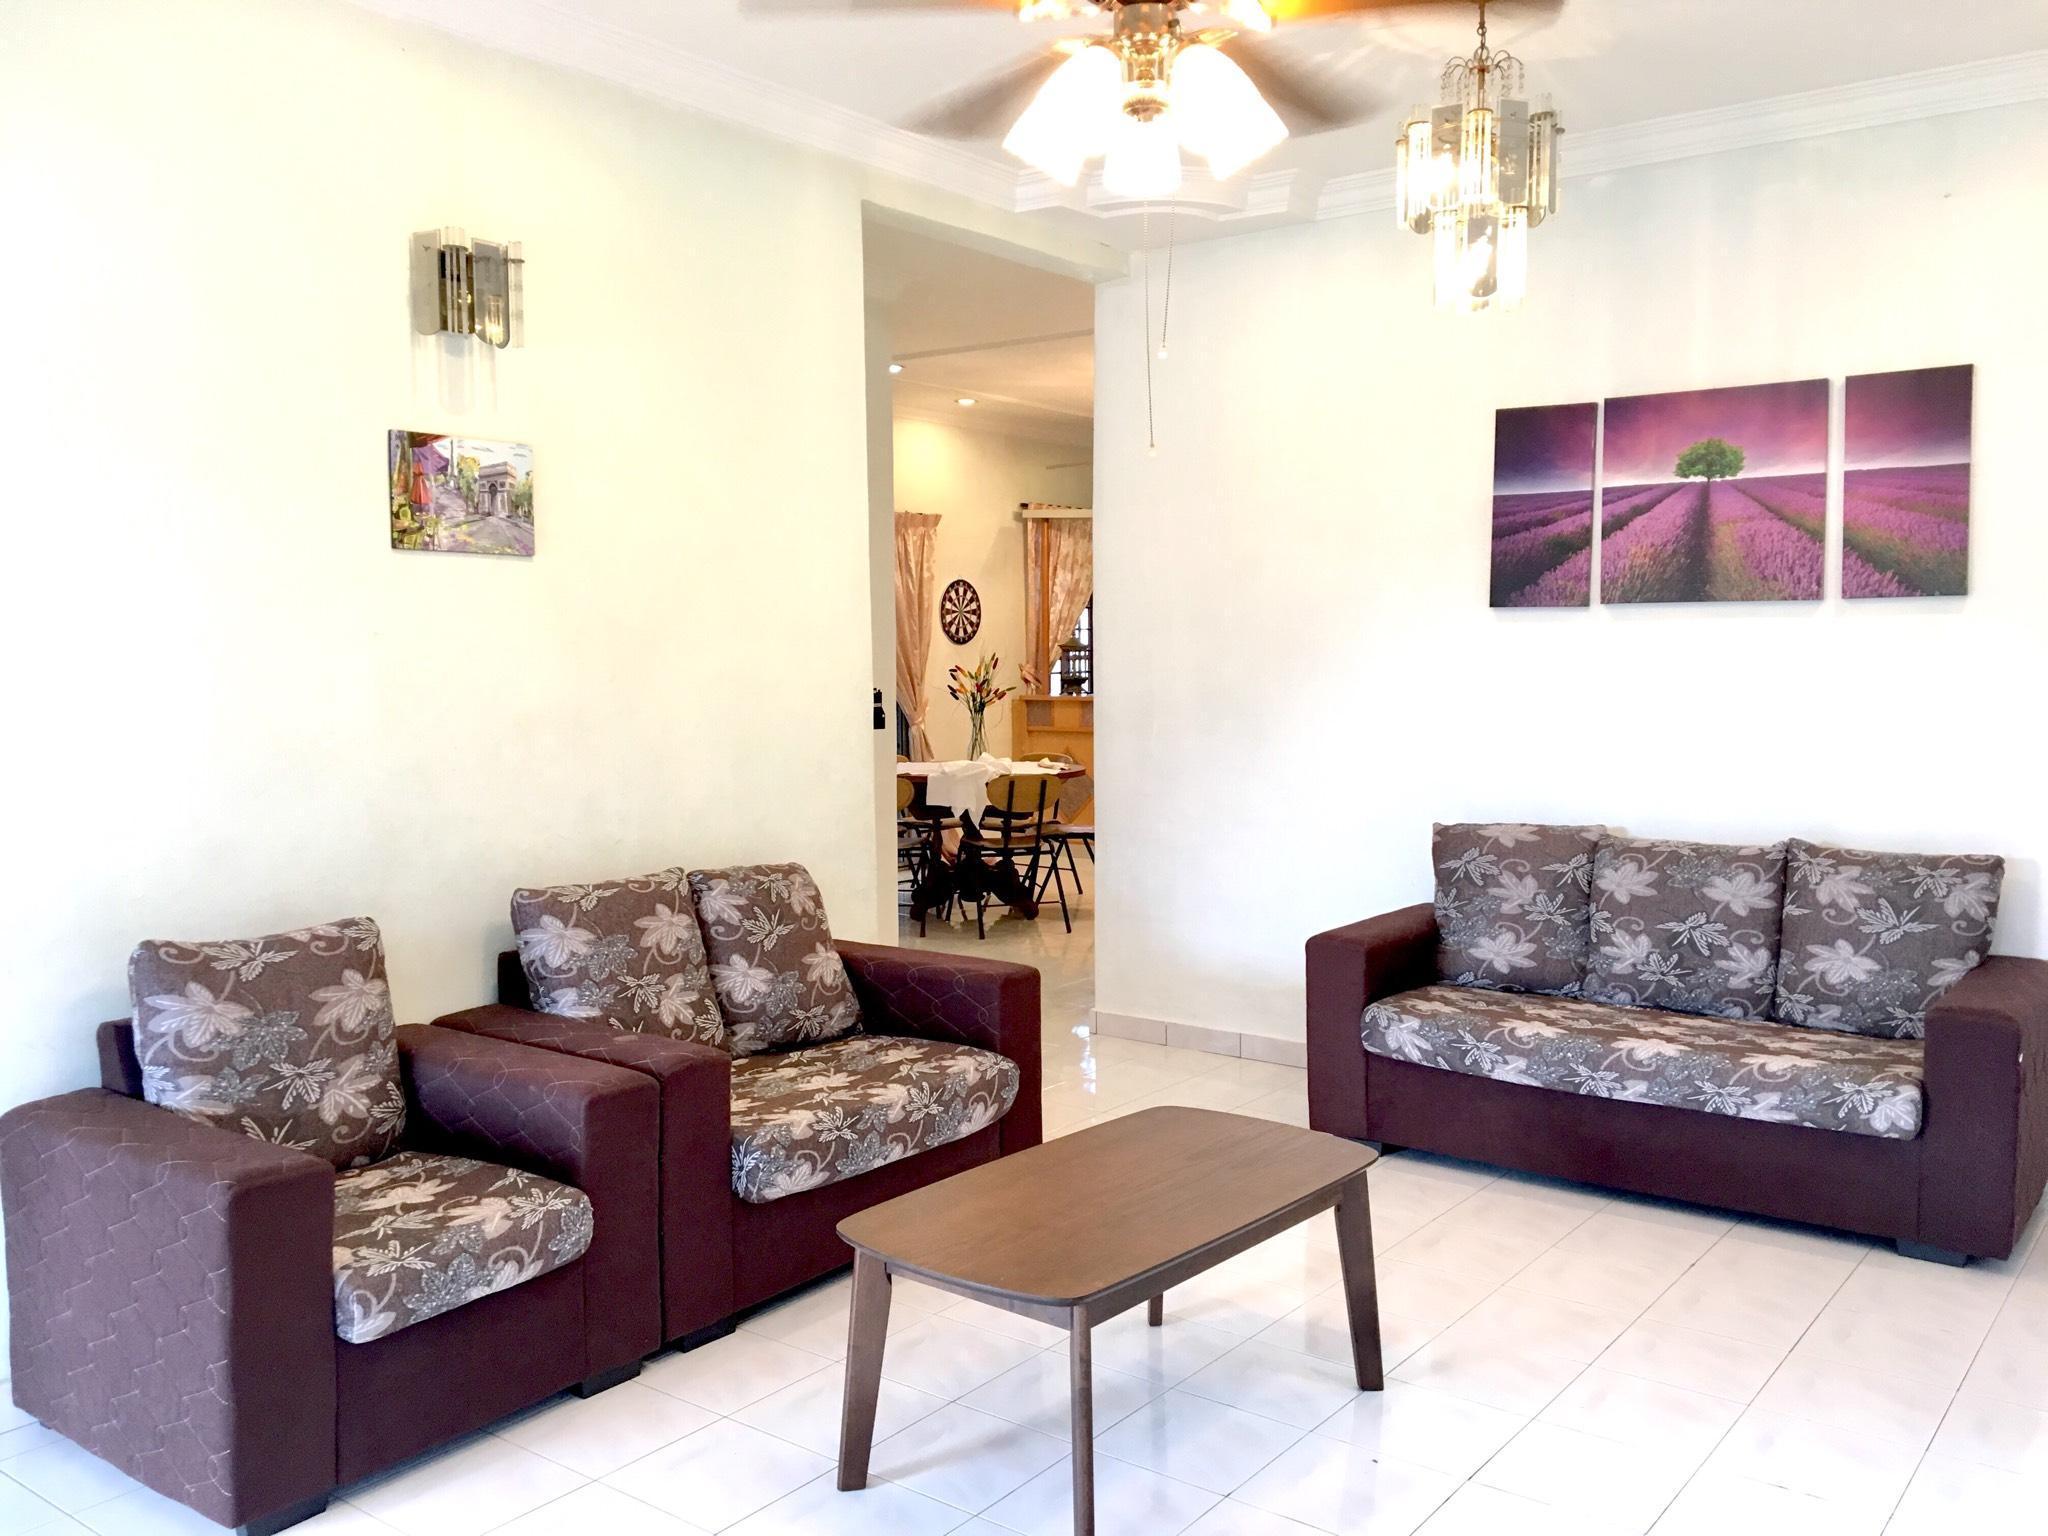 Ipoh Ampang Bungalow Suites  12 Pax